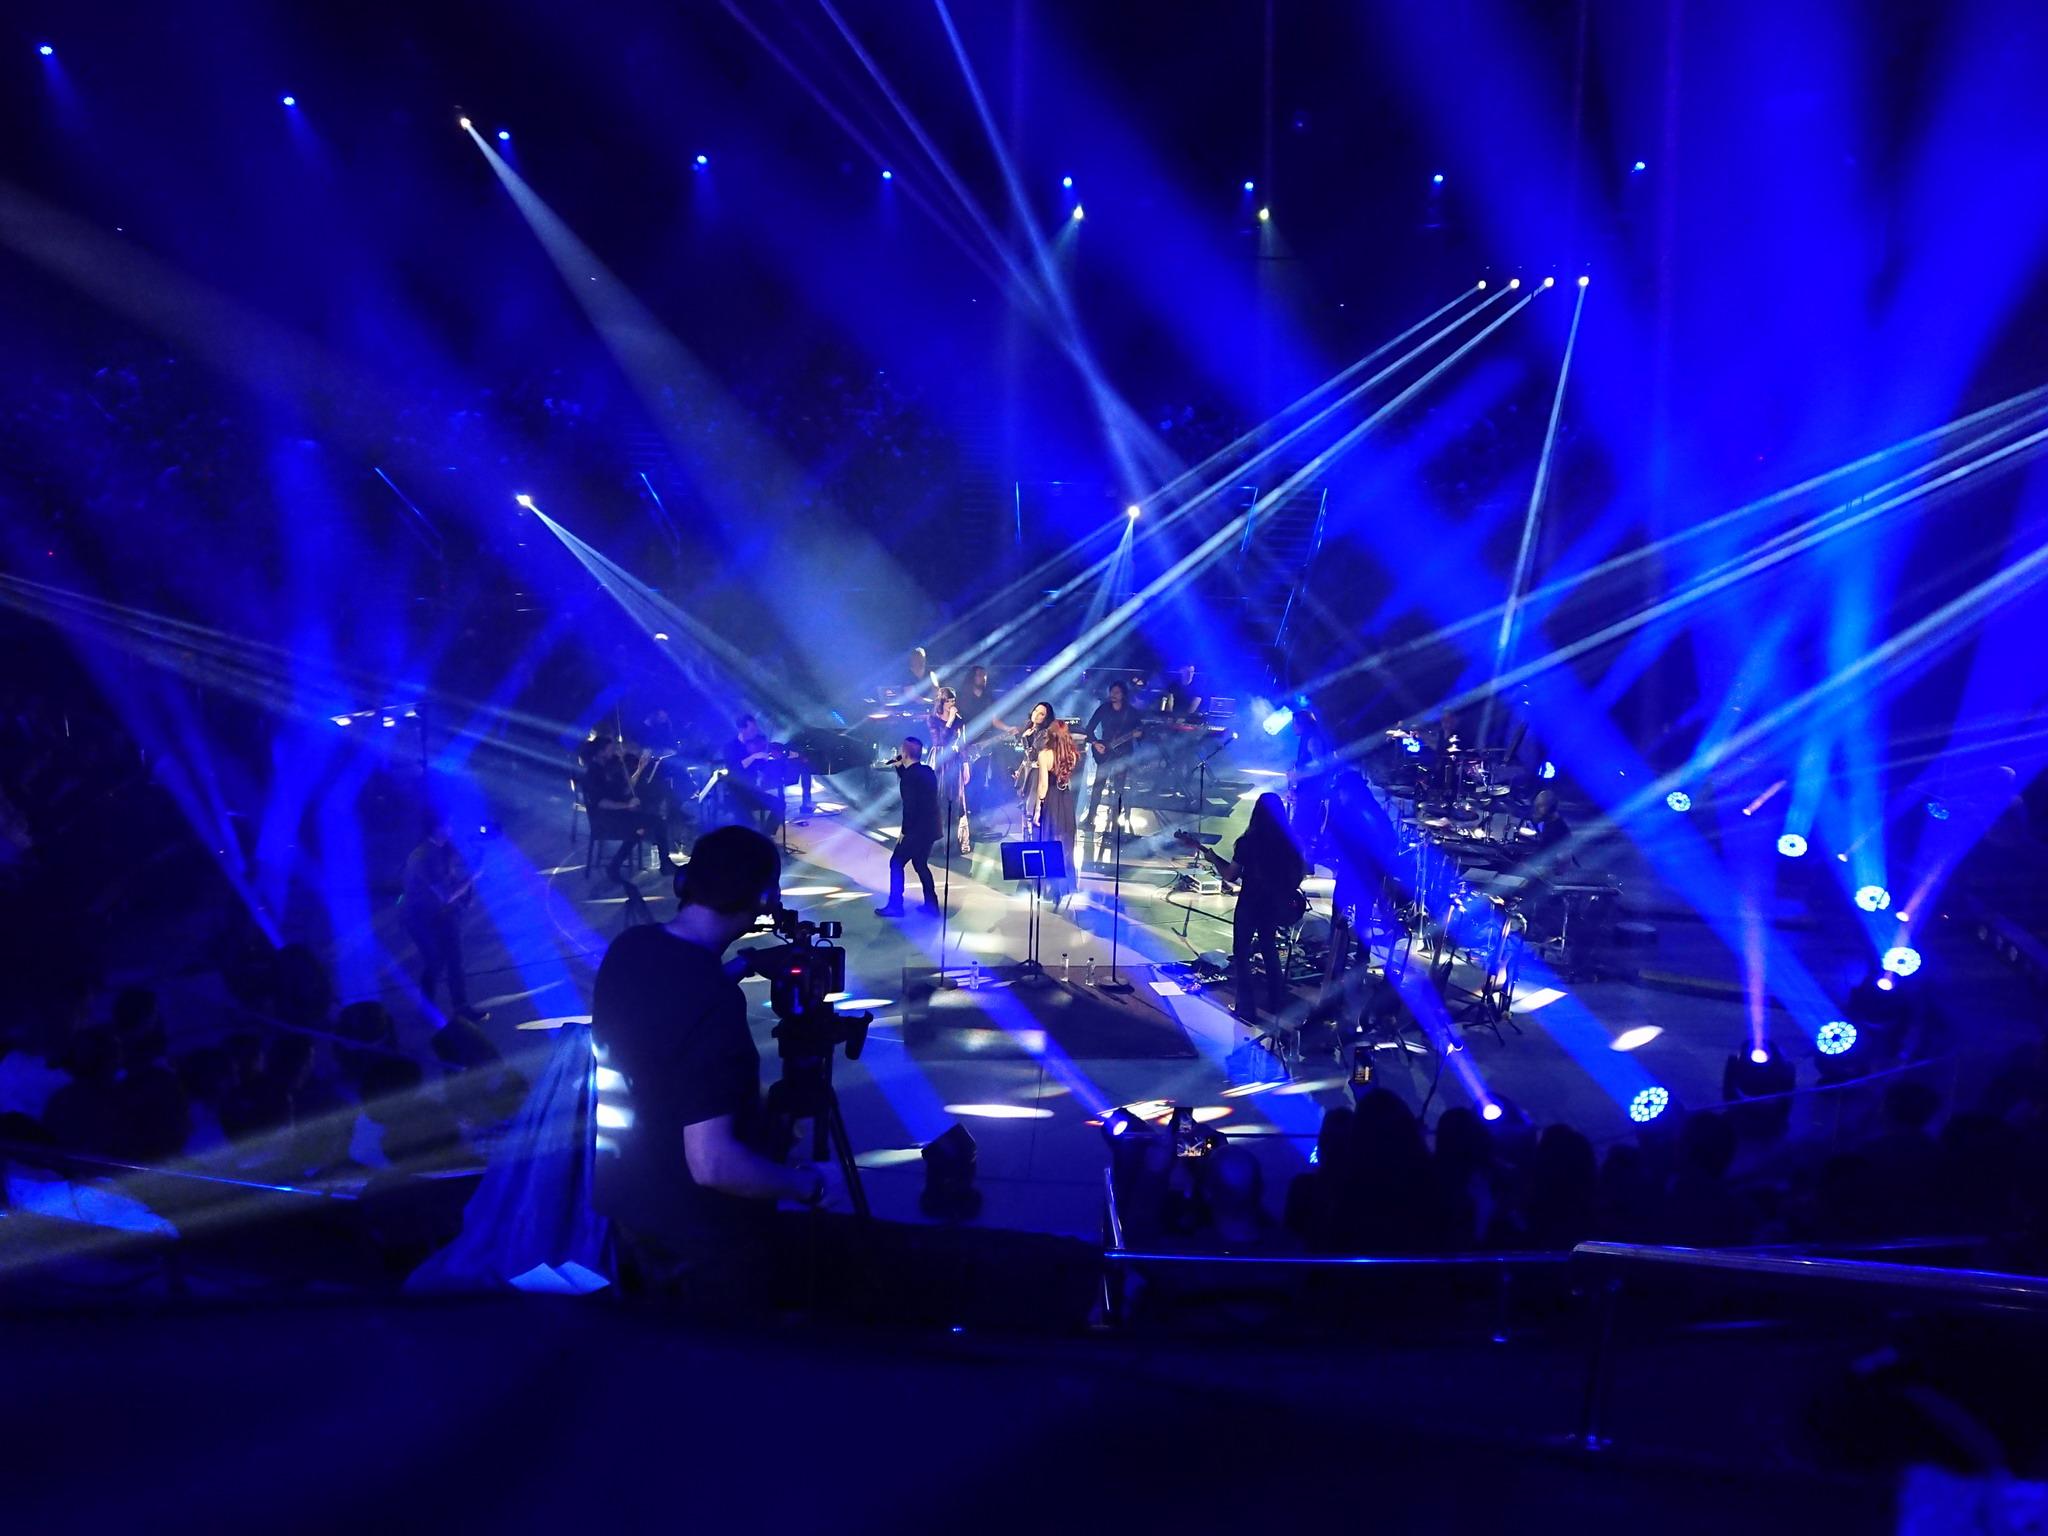 Tarja Turunen – 360 Degrees Tour (23.01.2020)